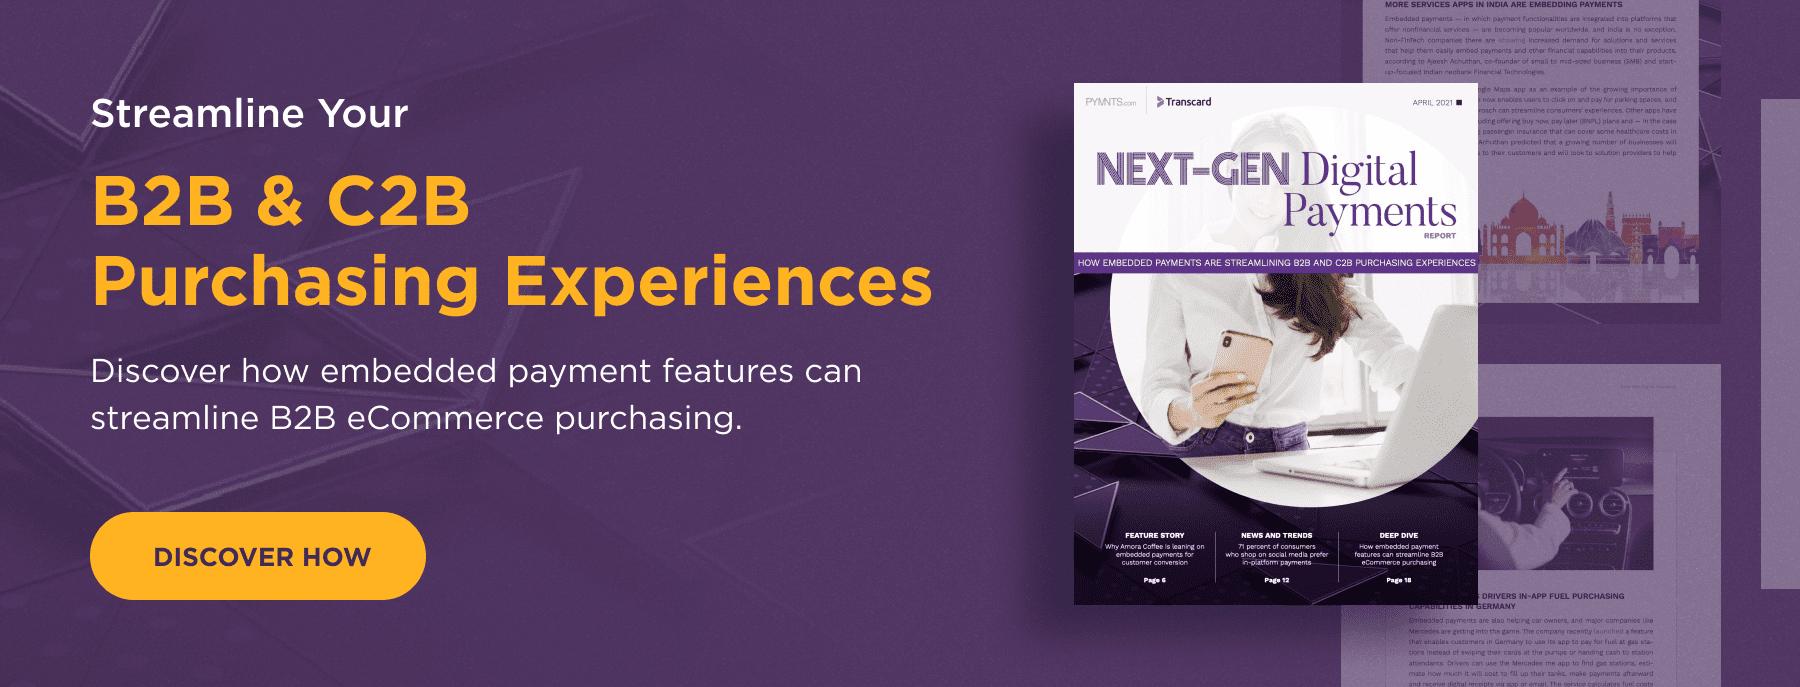 b2b-b2c-purchasing-experiences